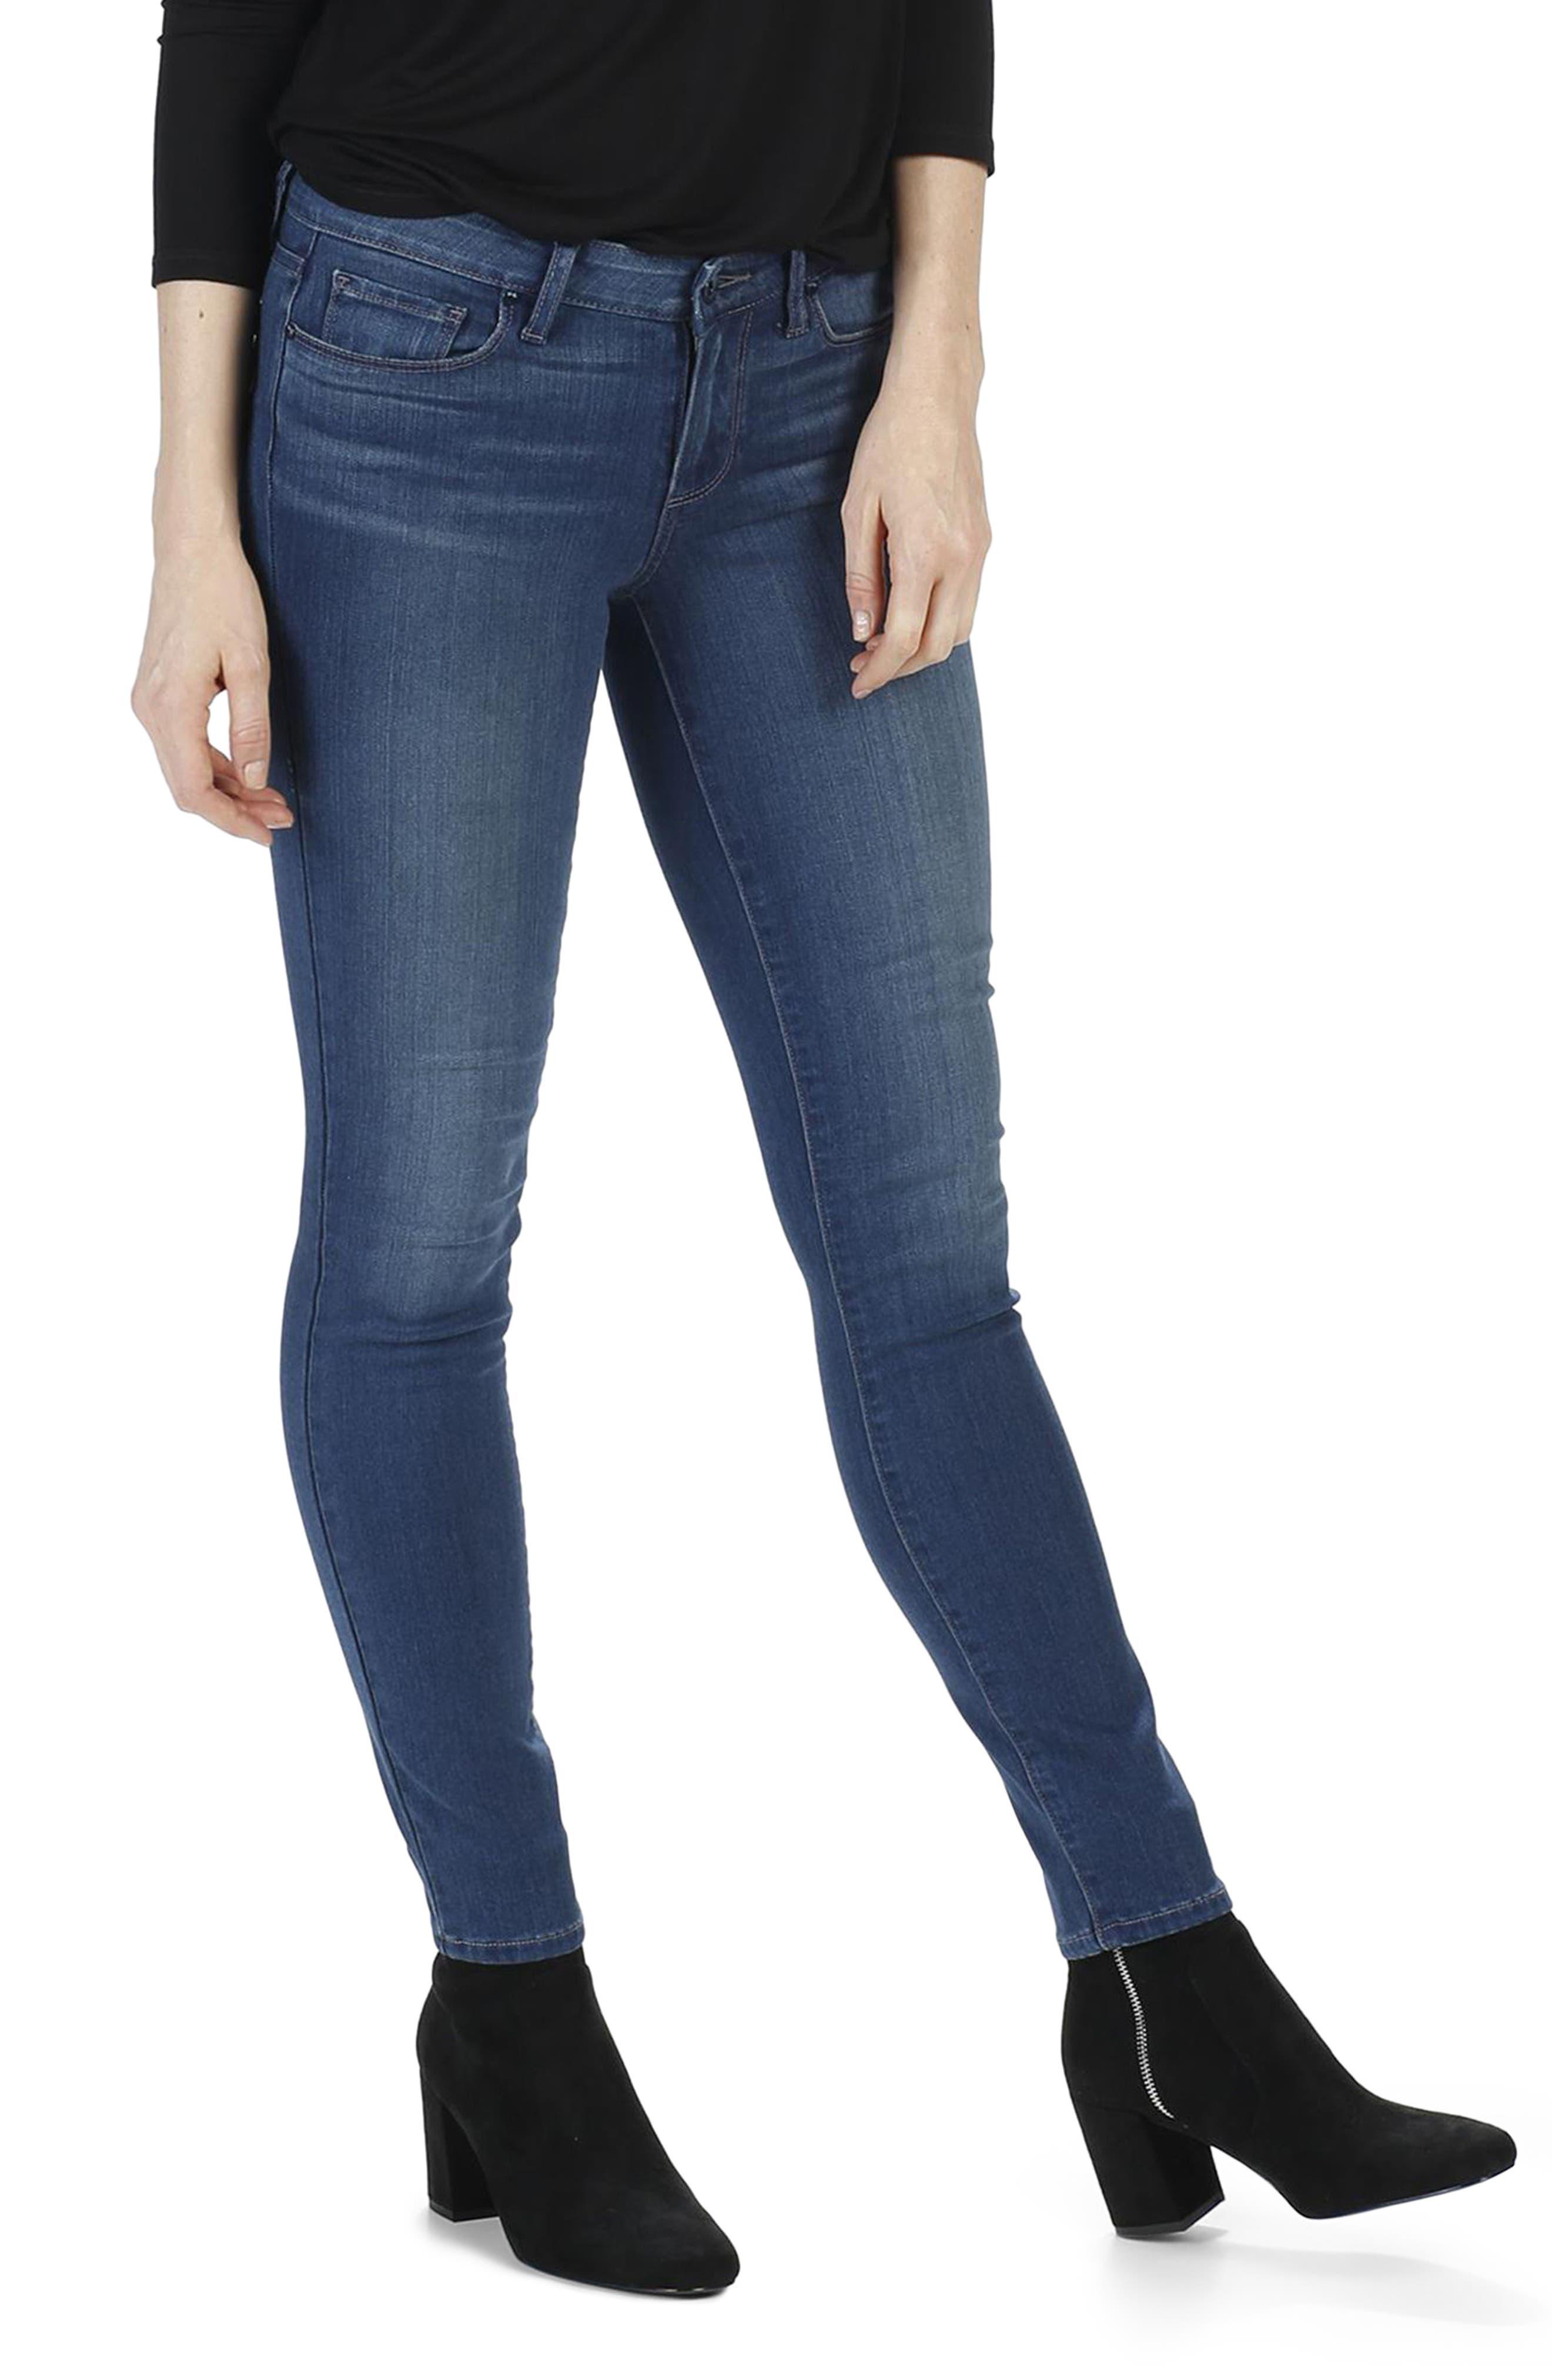 Alternate Image 1 Selected - PAIGE Transcend - Verdugo Ultra Skinny Jeans (Vida)